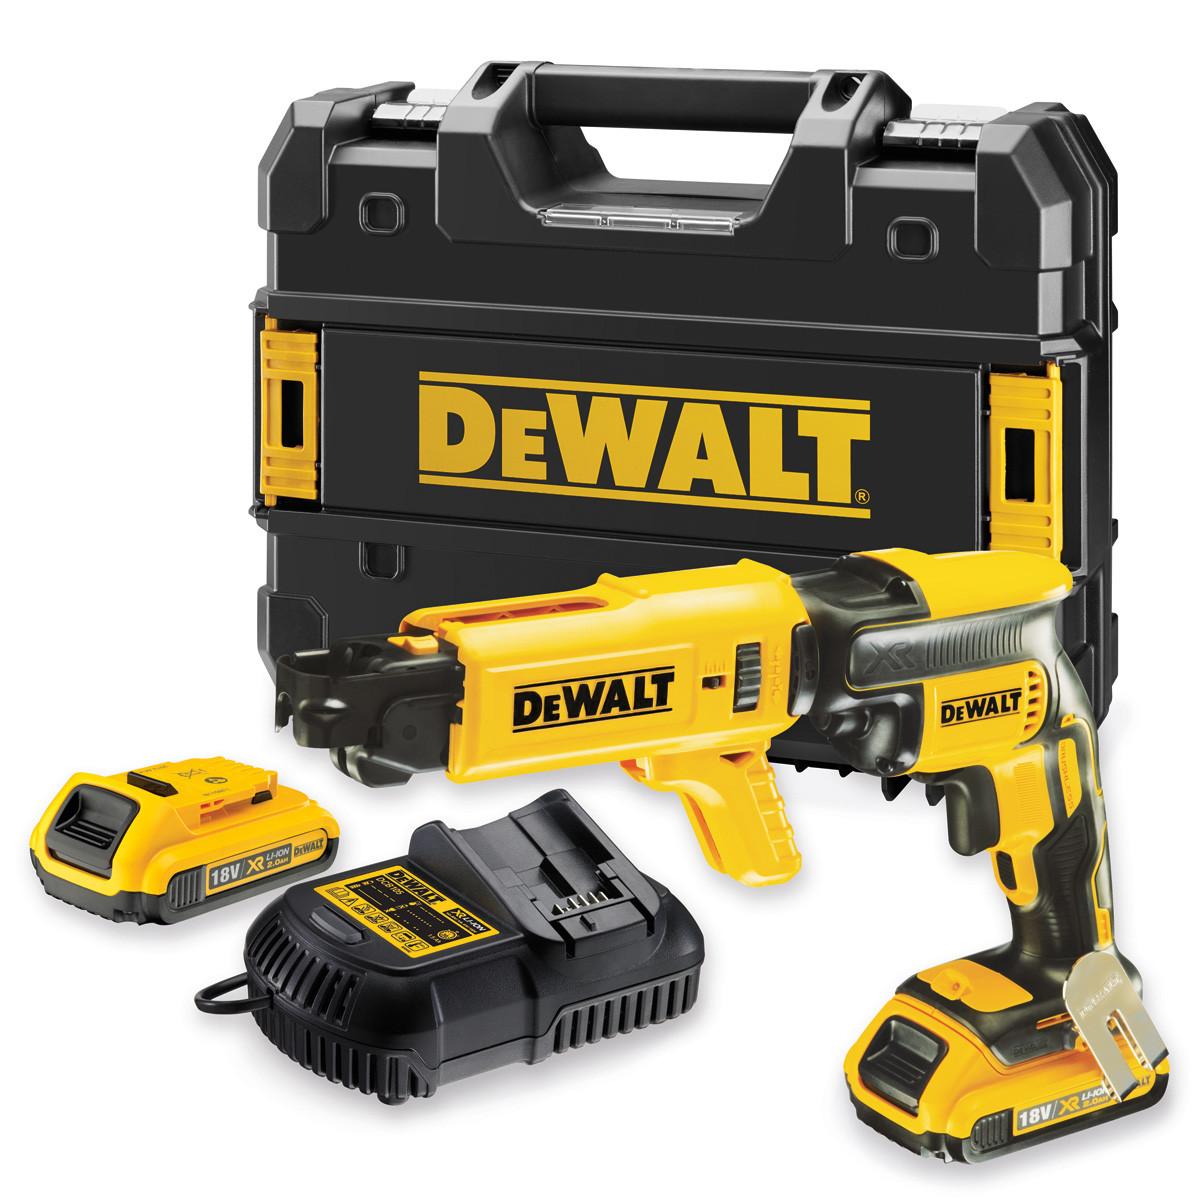 Dewalt Dcf620d2k Brushless Collated Drywall Screwdriver